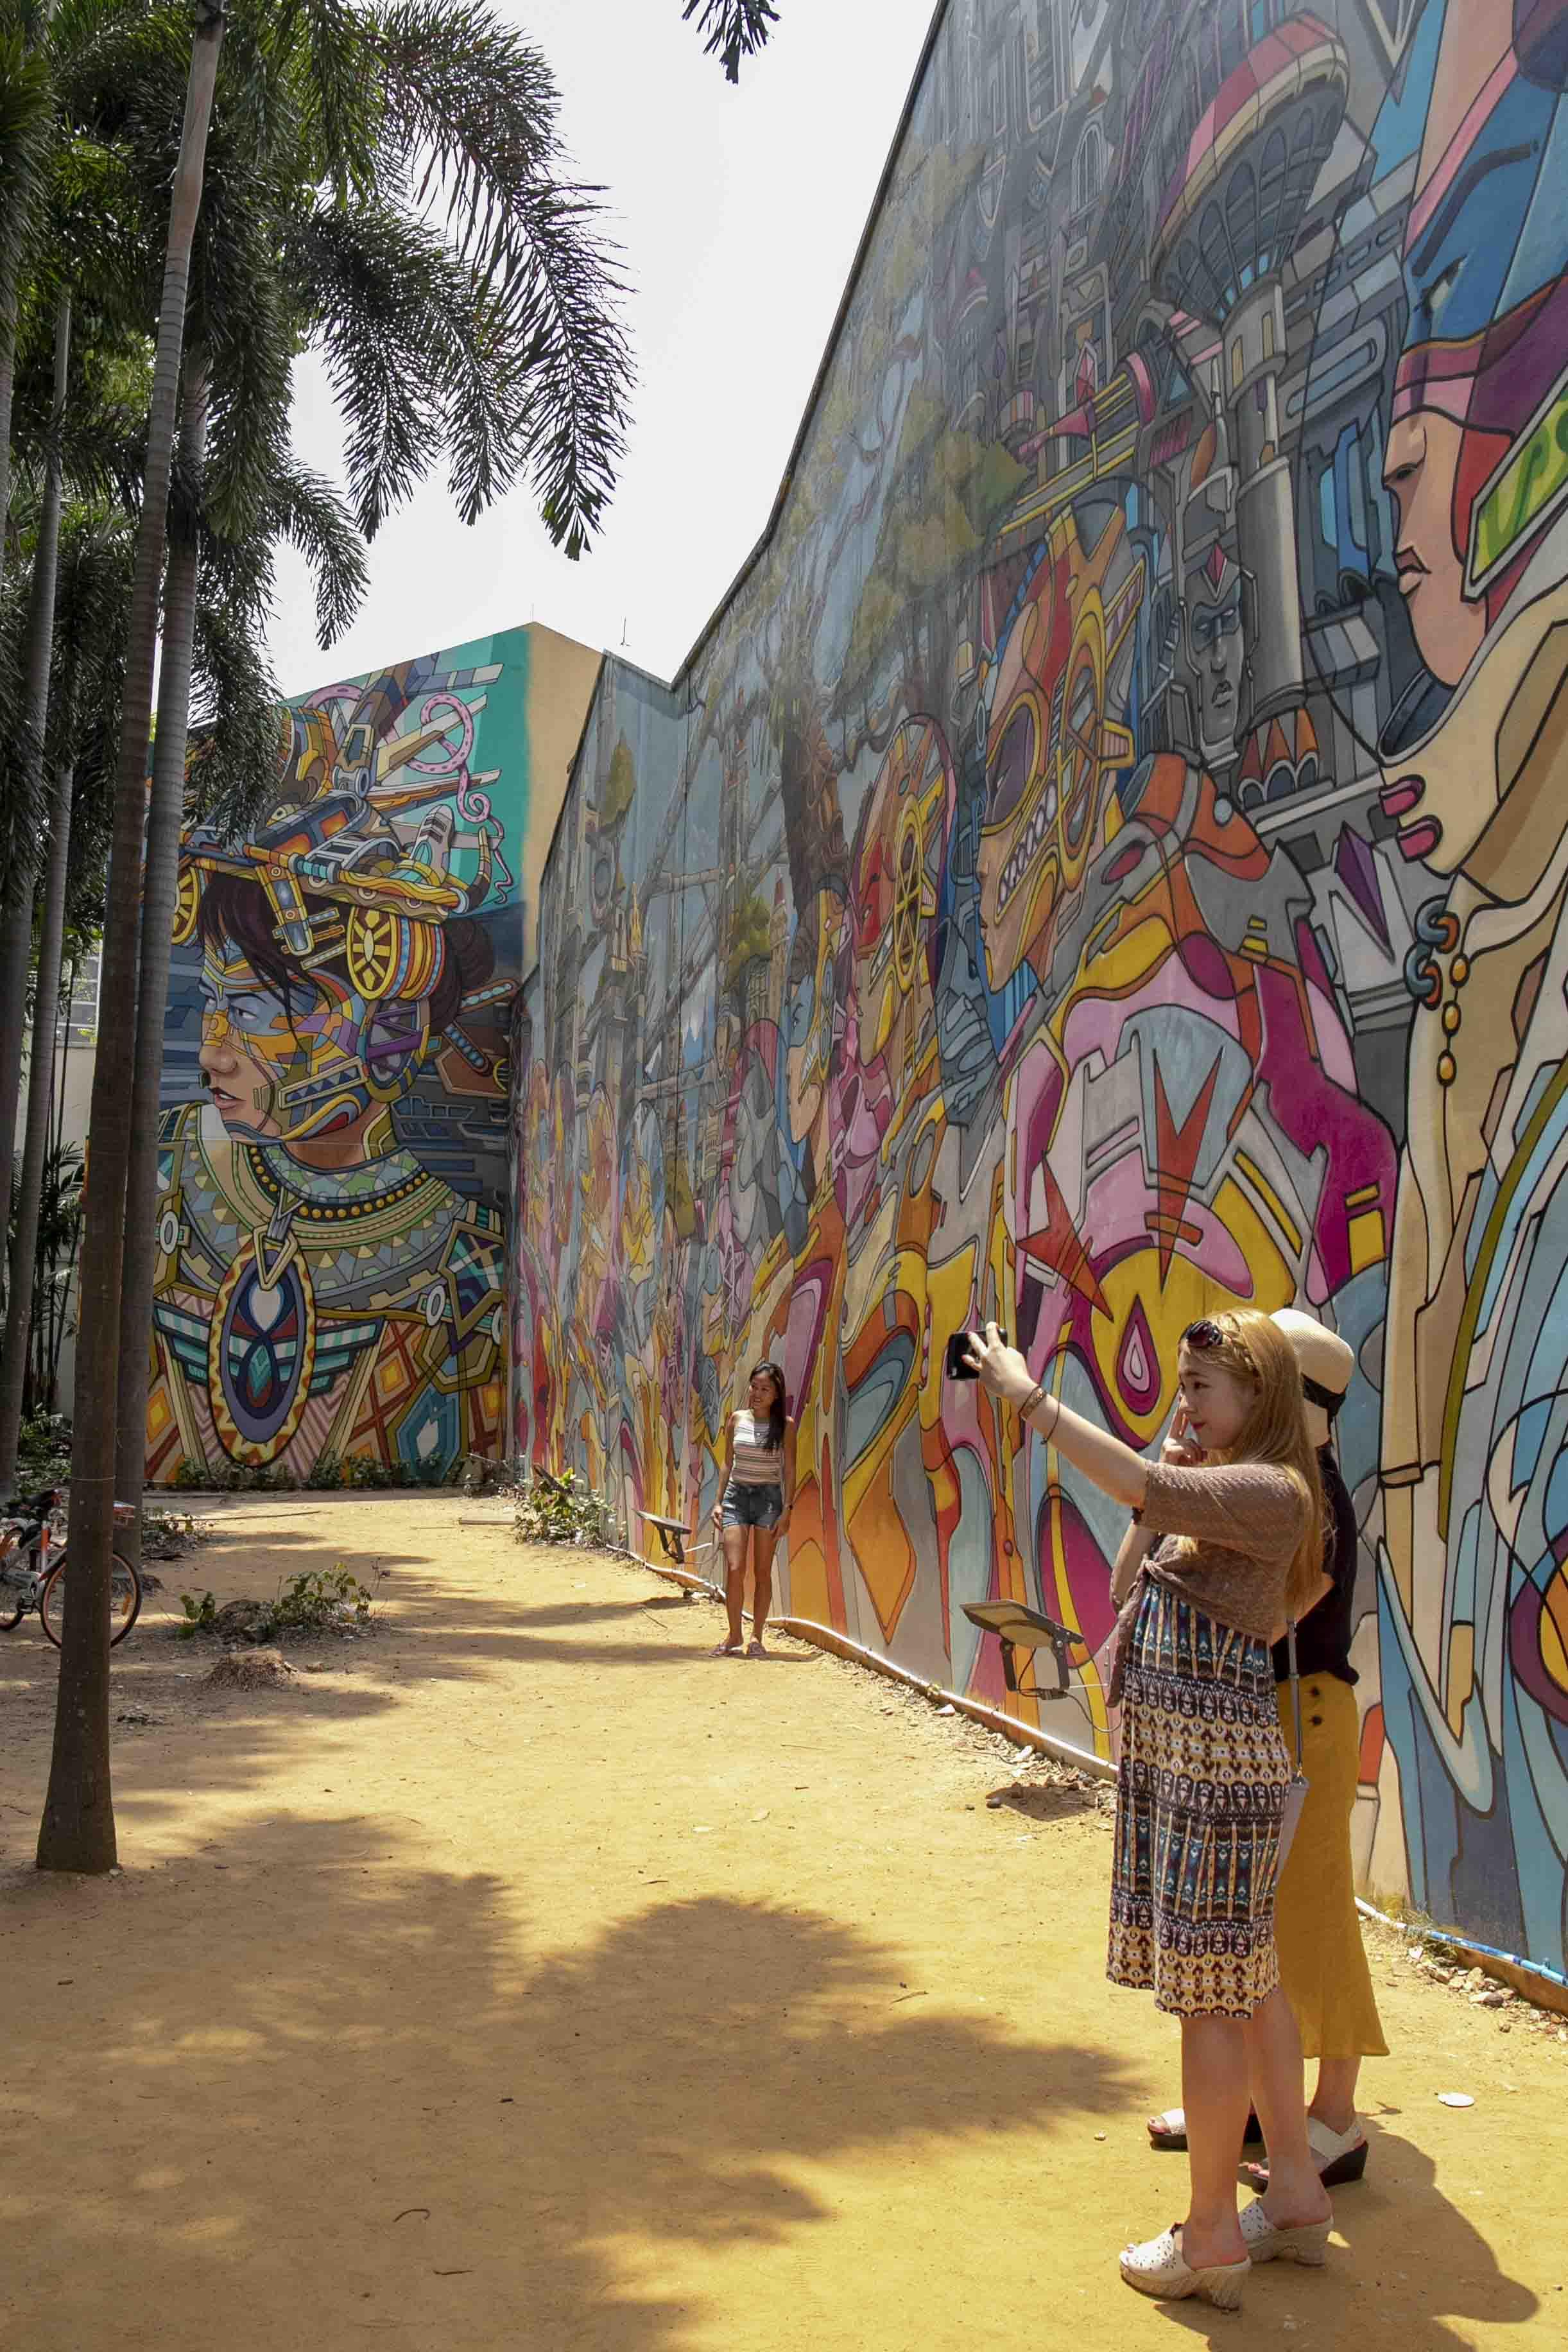 Streetart in Kampong Glam